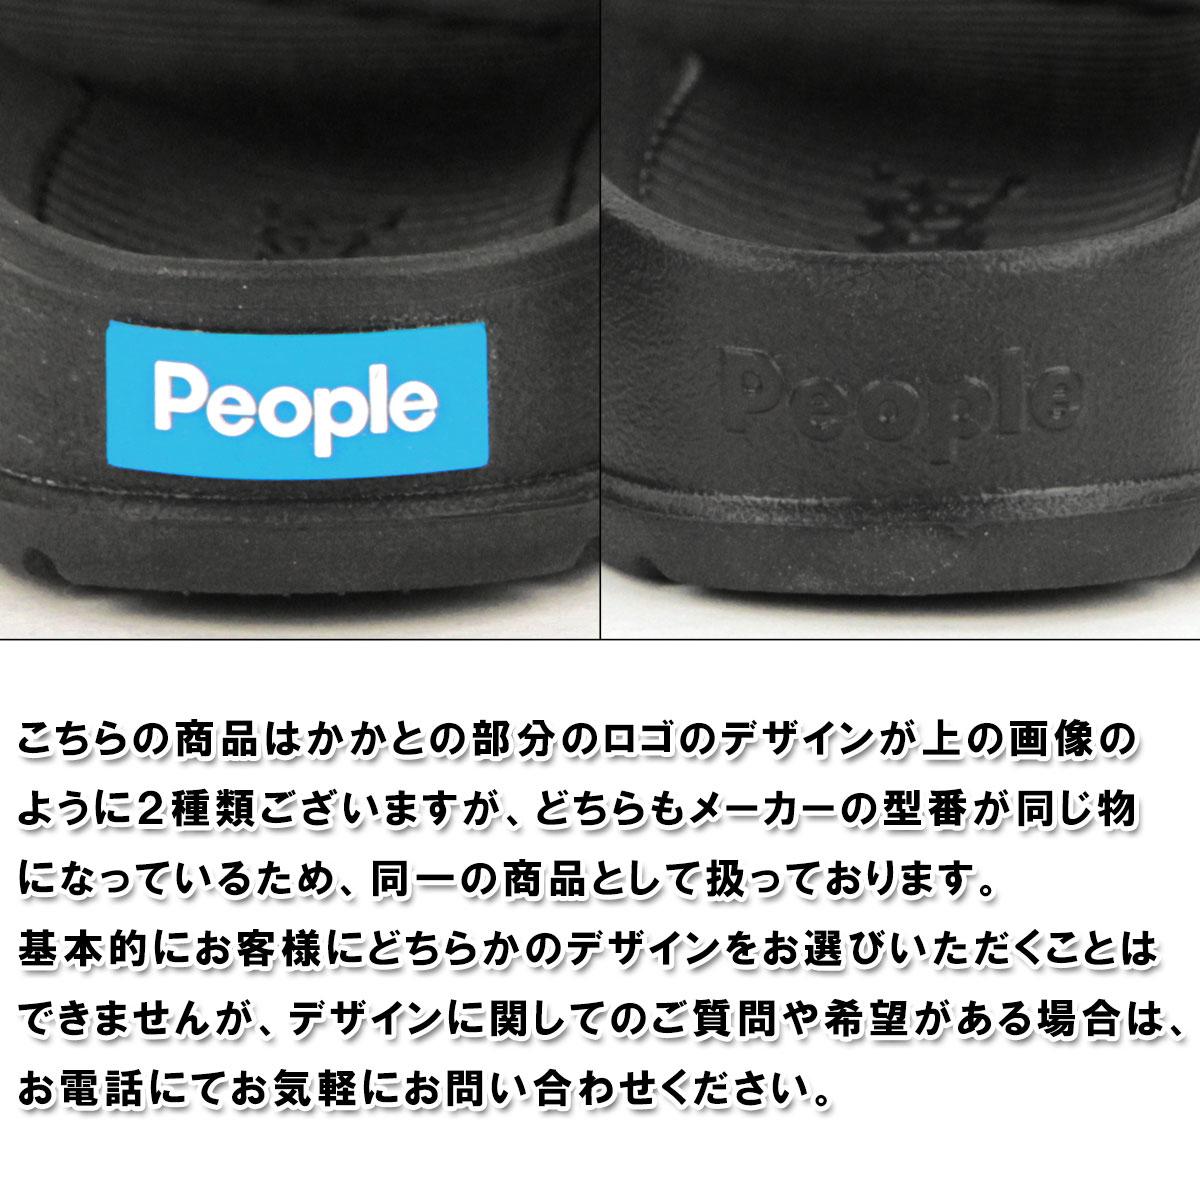 people_1